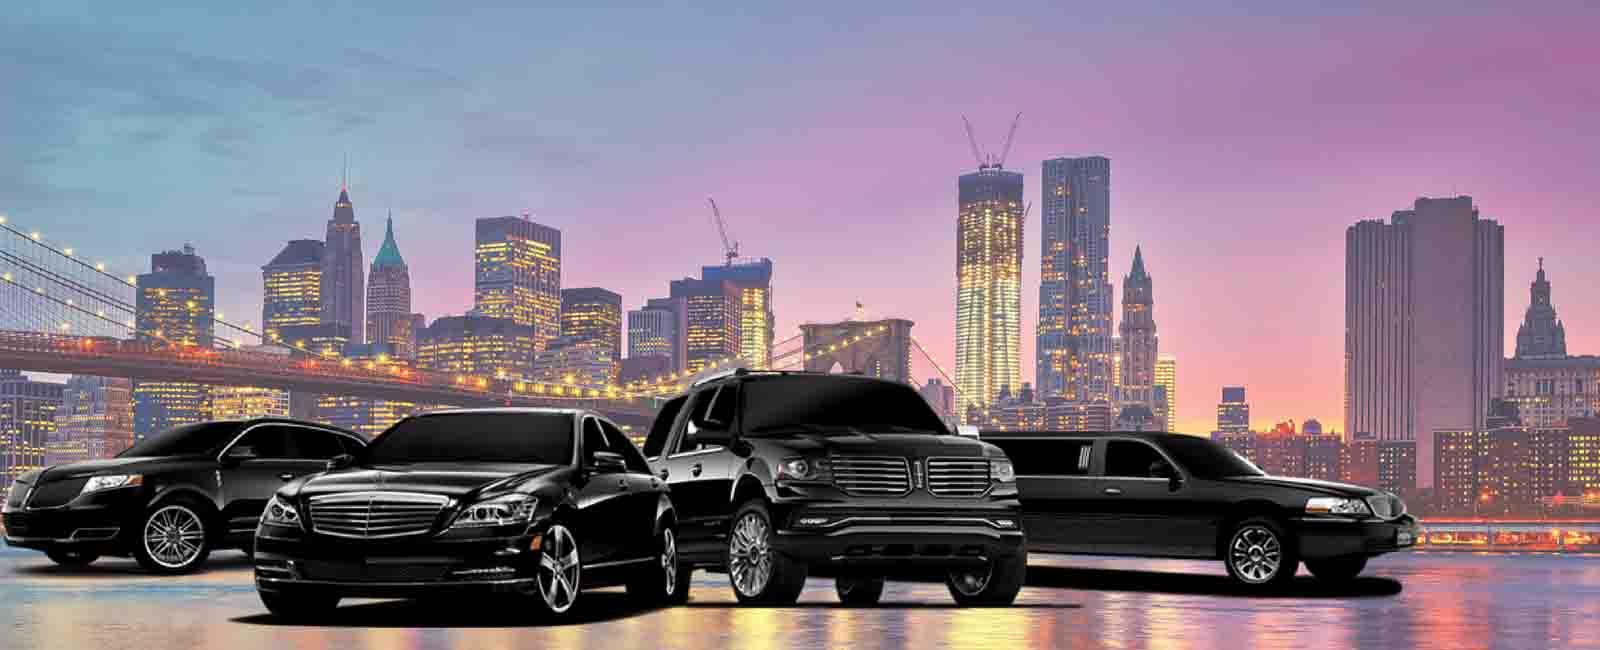 long island nyc limousine